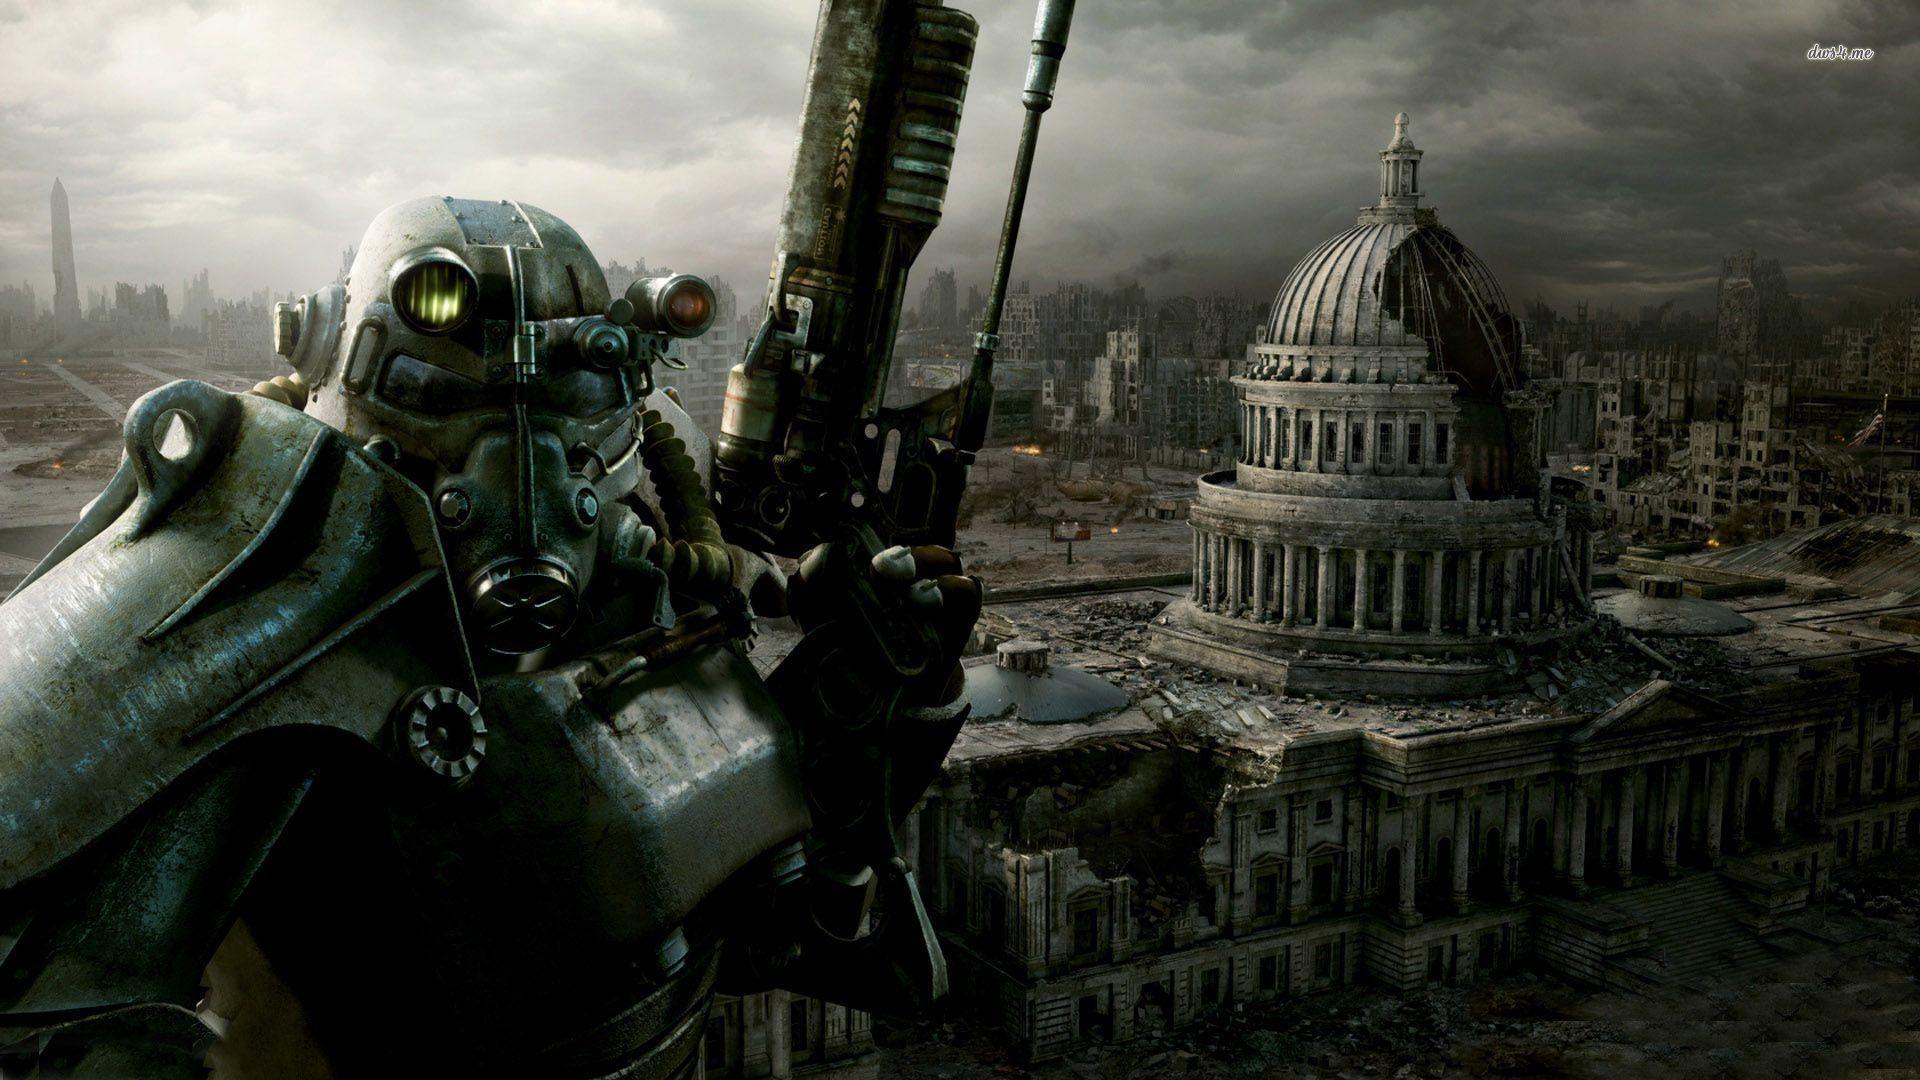 Fallout 3 Desktop Background Fallout Wallpaper Wallpaper Pictures Backgrounds Desktop